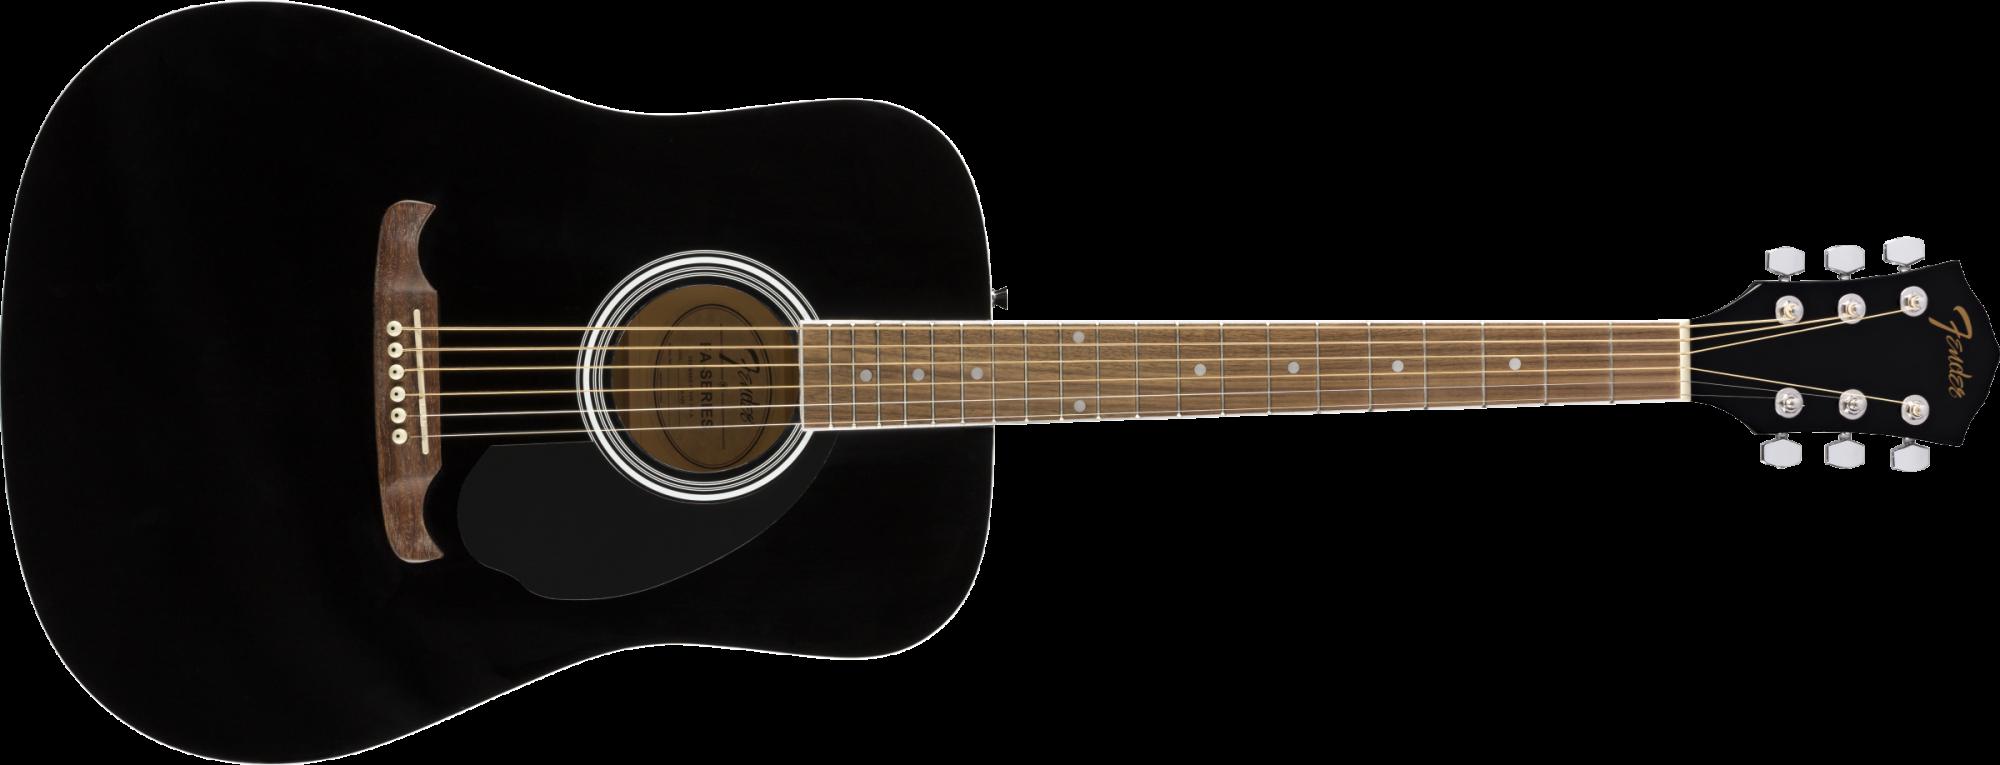 Fender FA-125 Dreadnought, Walnut Fingerboard, Black w/Bag